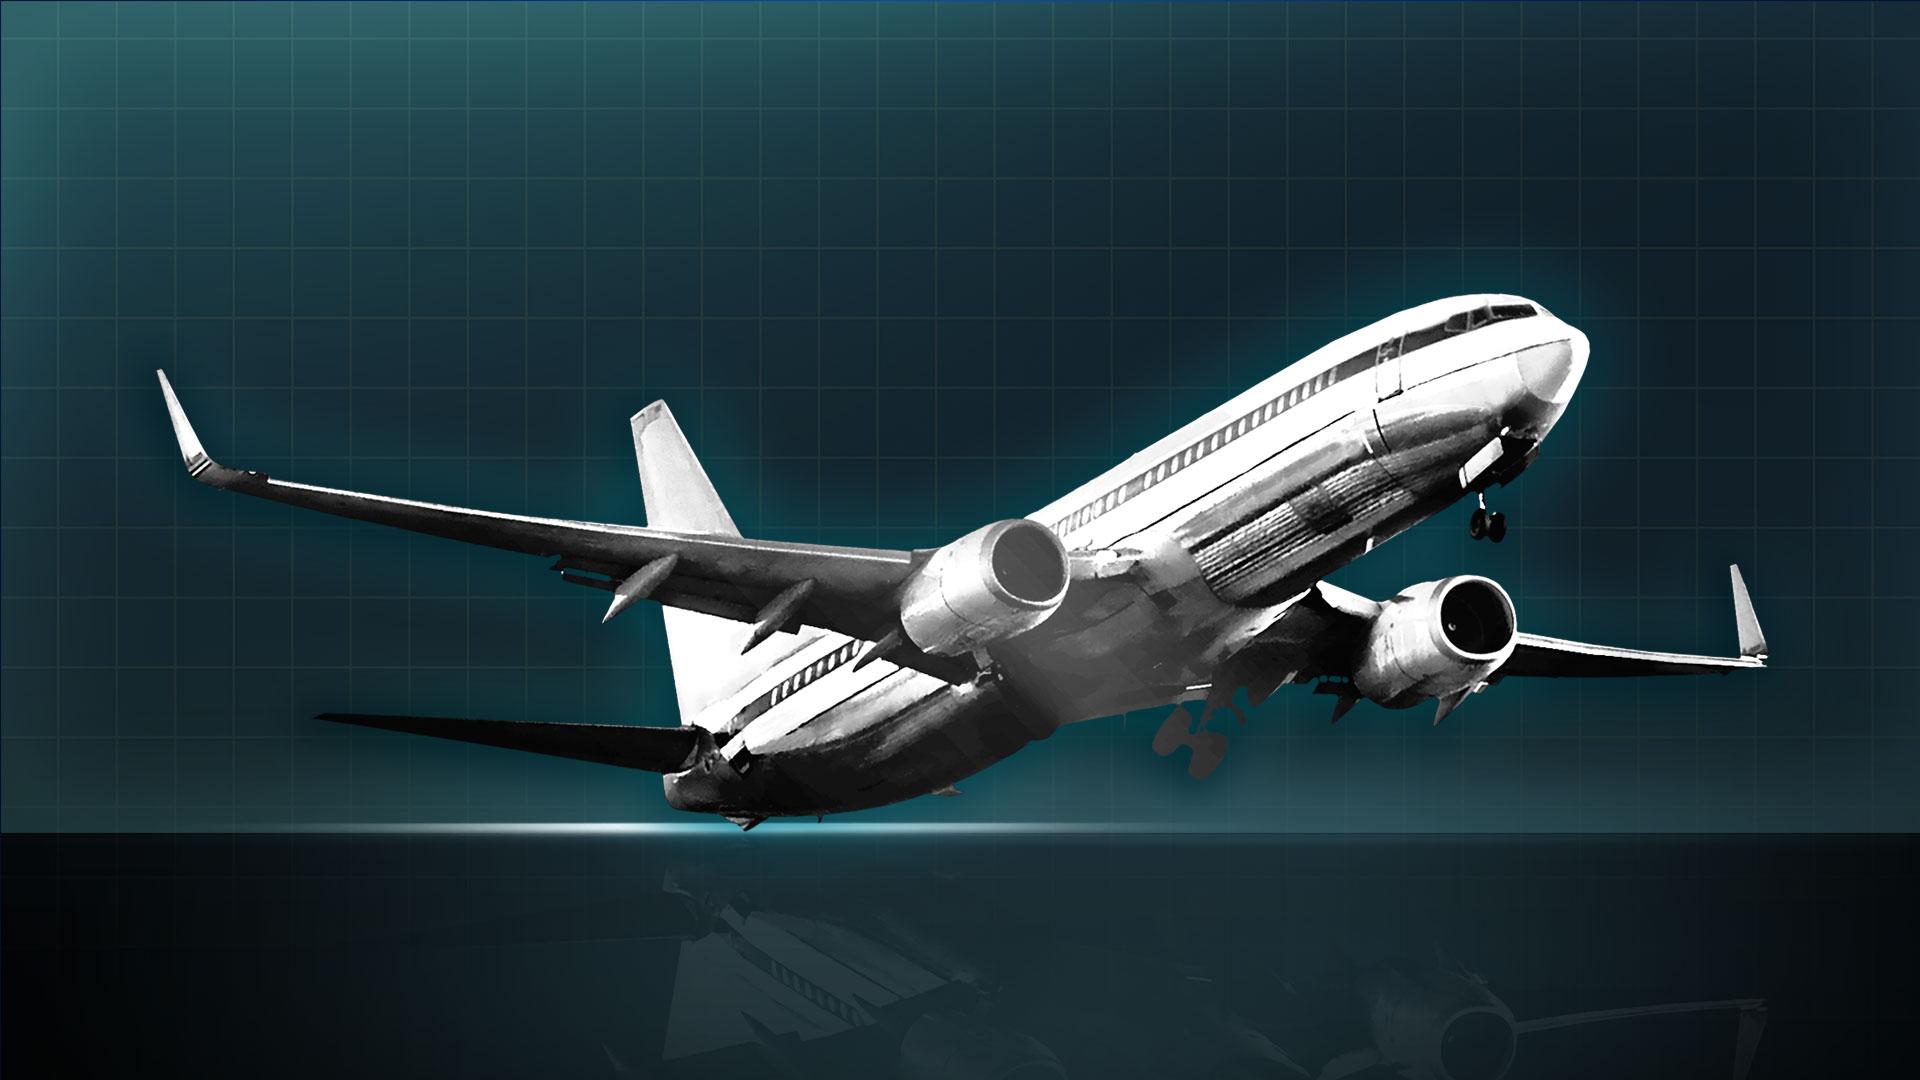 KELO Airplane